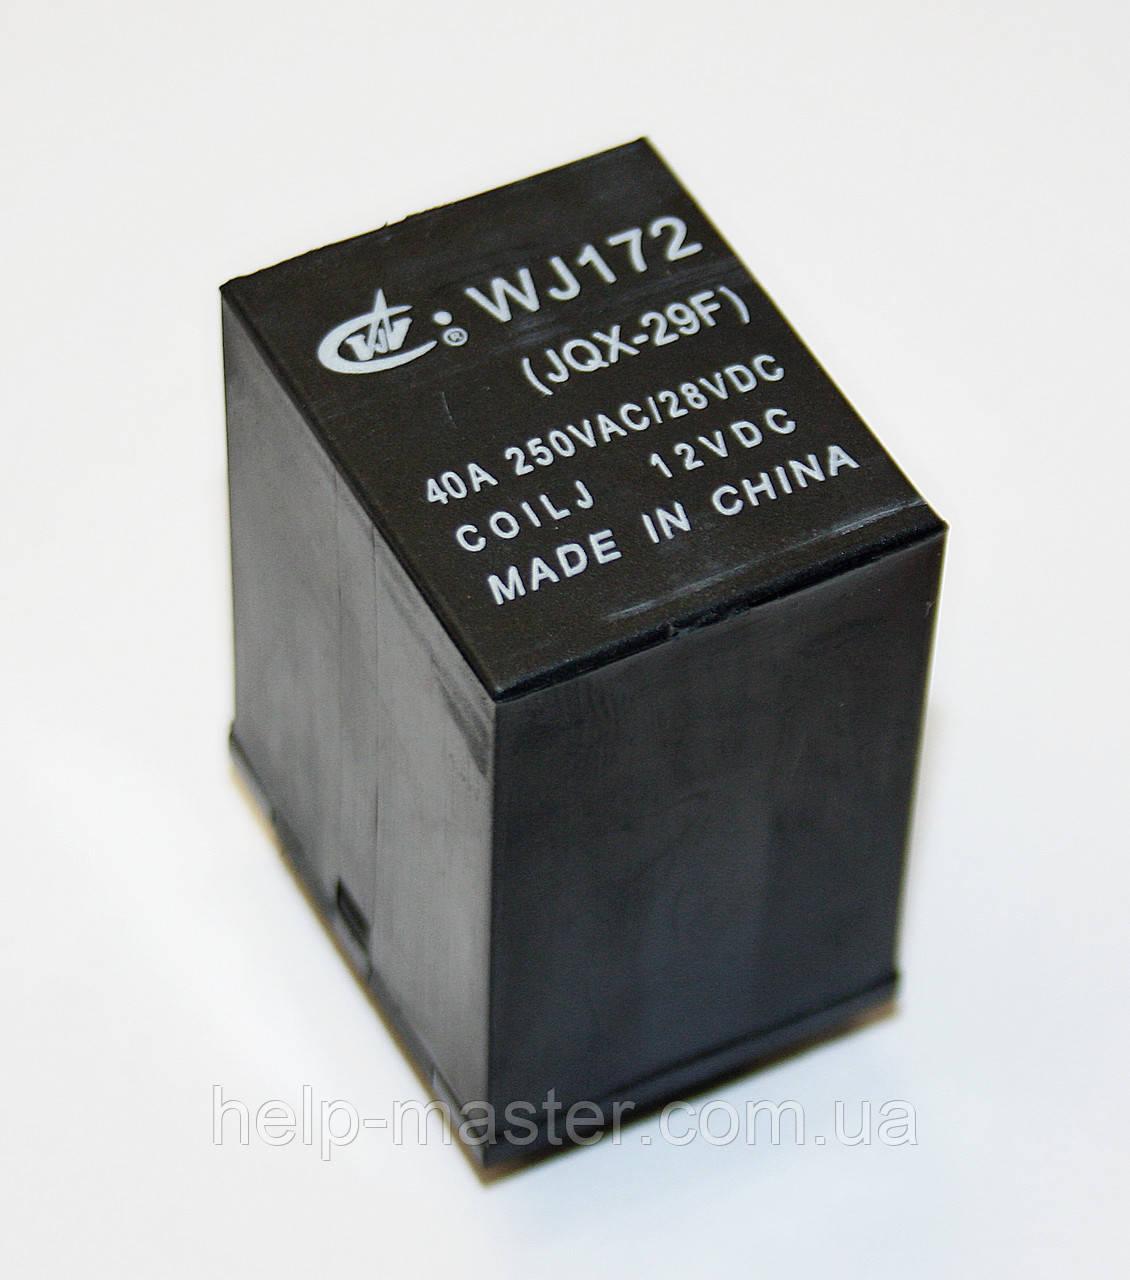 Електромеханічне Реле WJ172 (JQX-29F) 12VDC